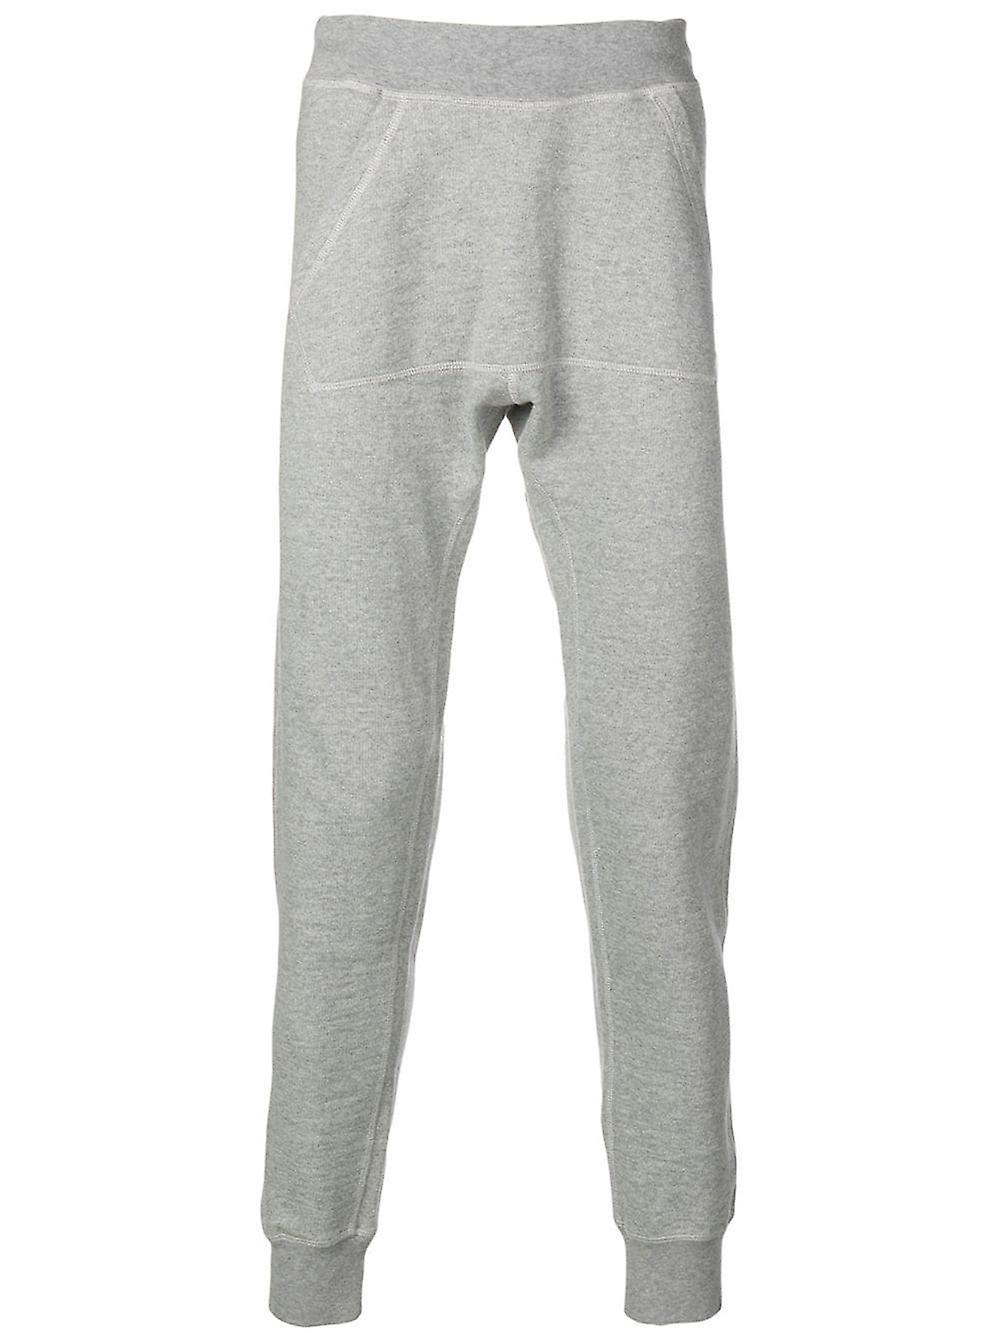 Skinny Fit Logo Sweatpants